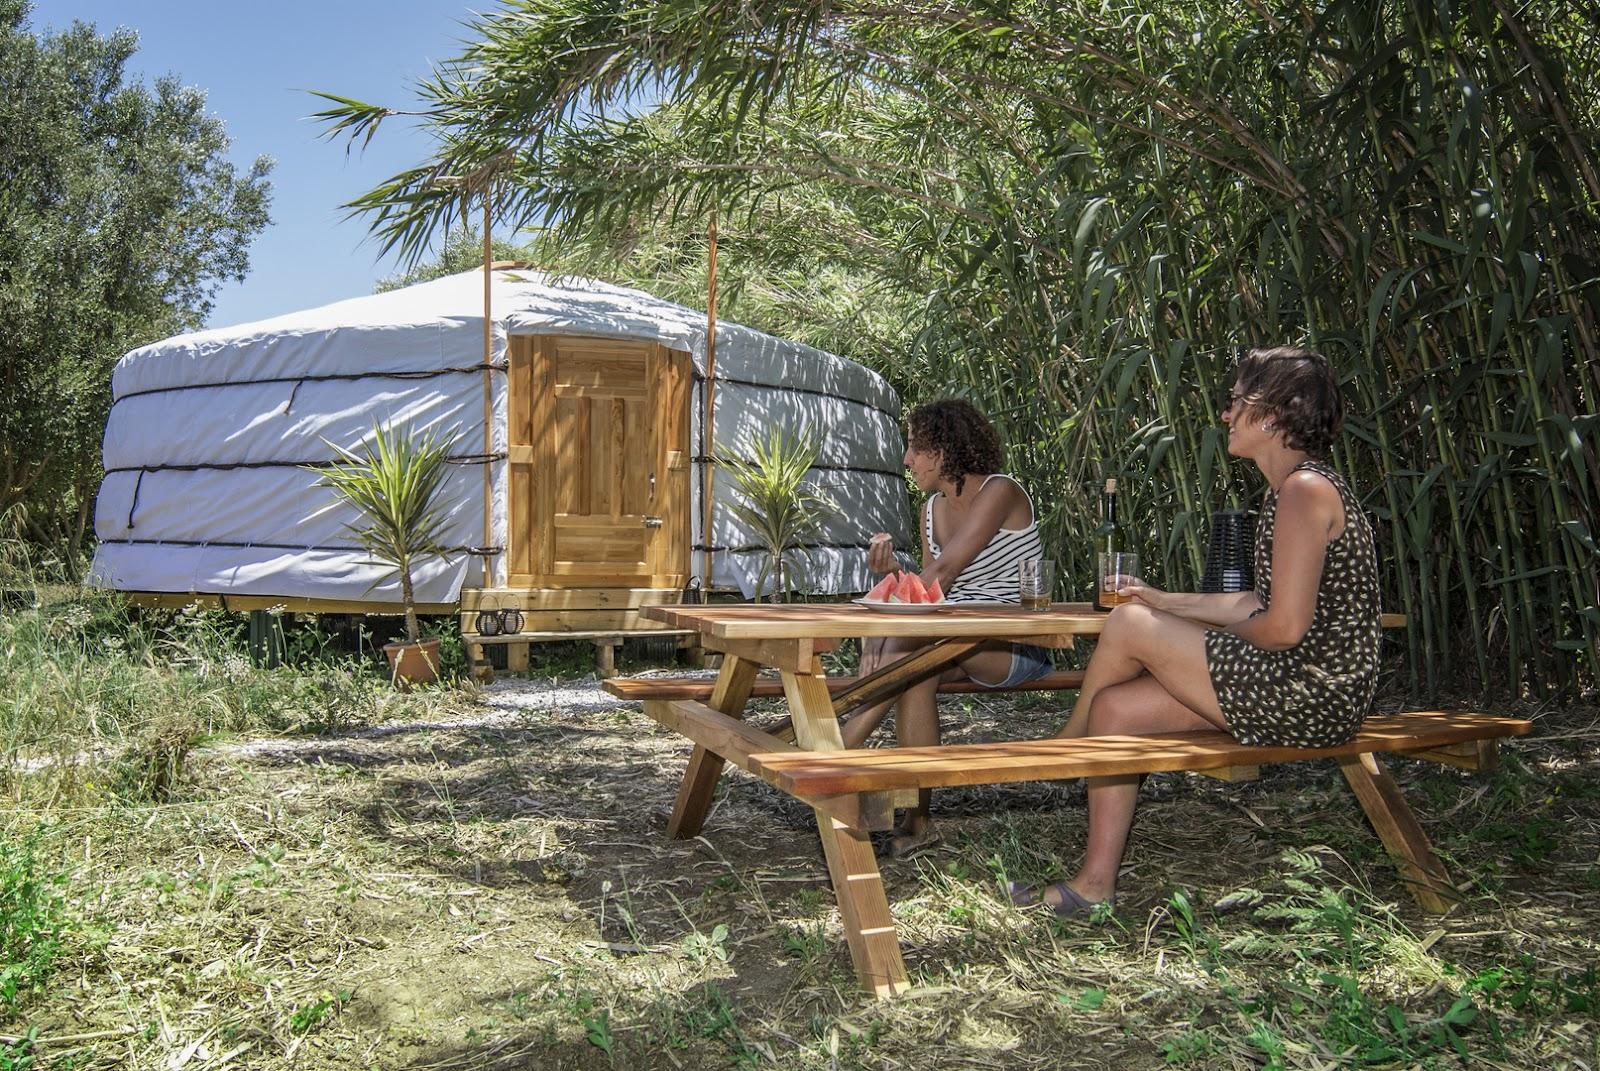 Where to go camping Mongolian Yurt Campspace Spain